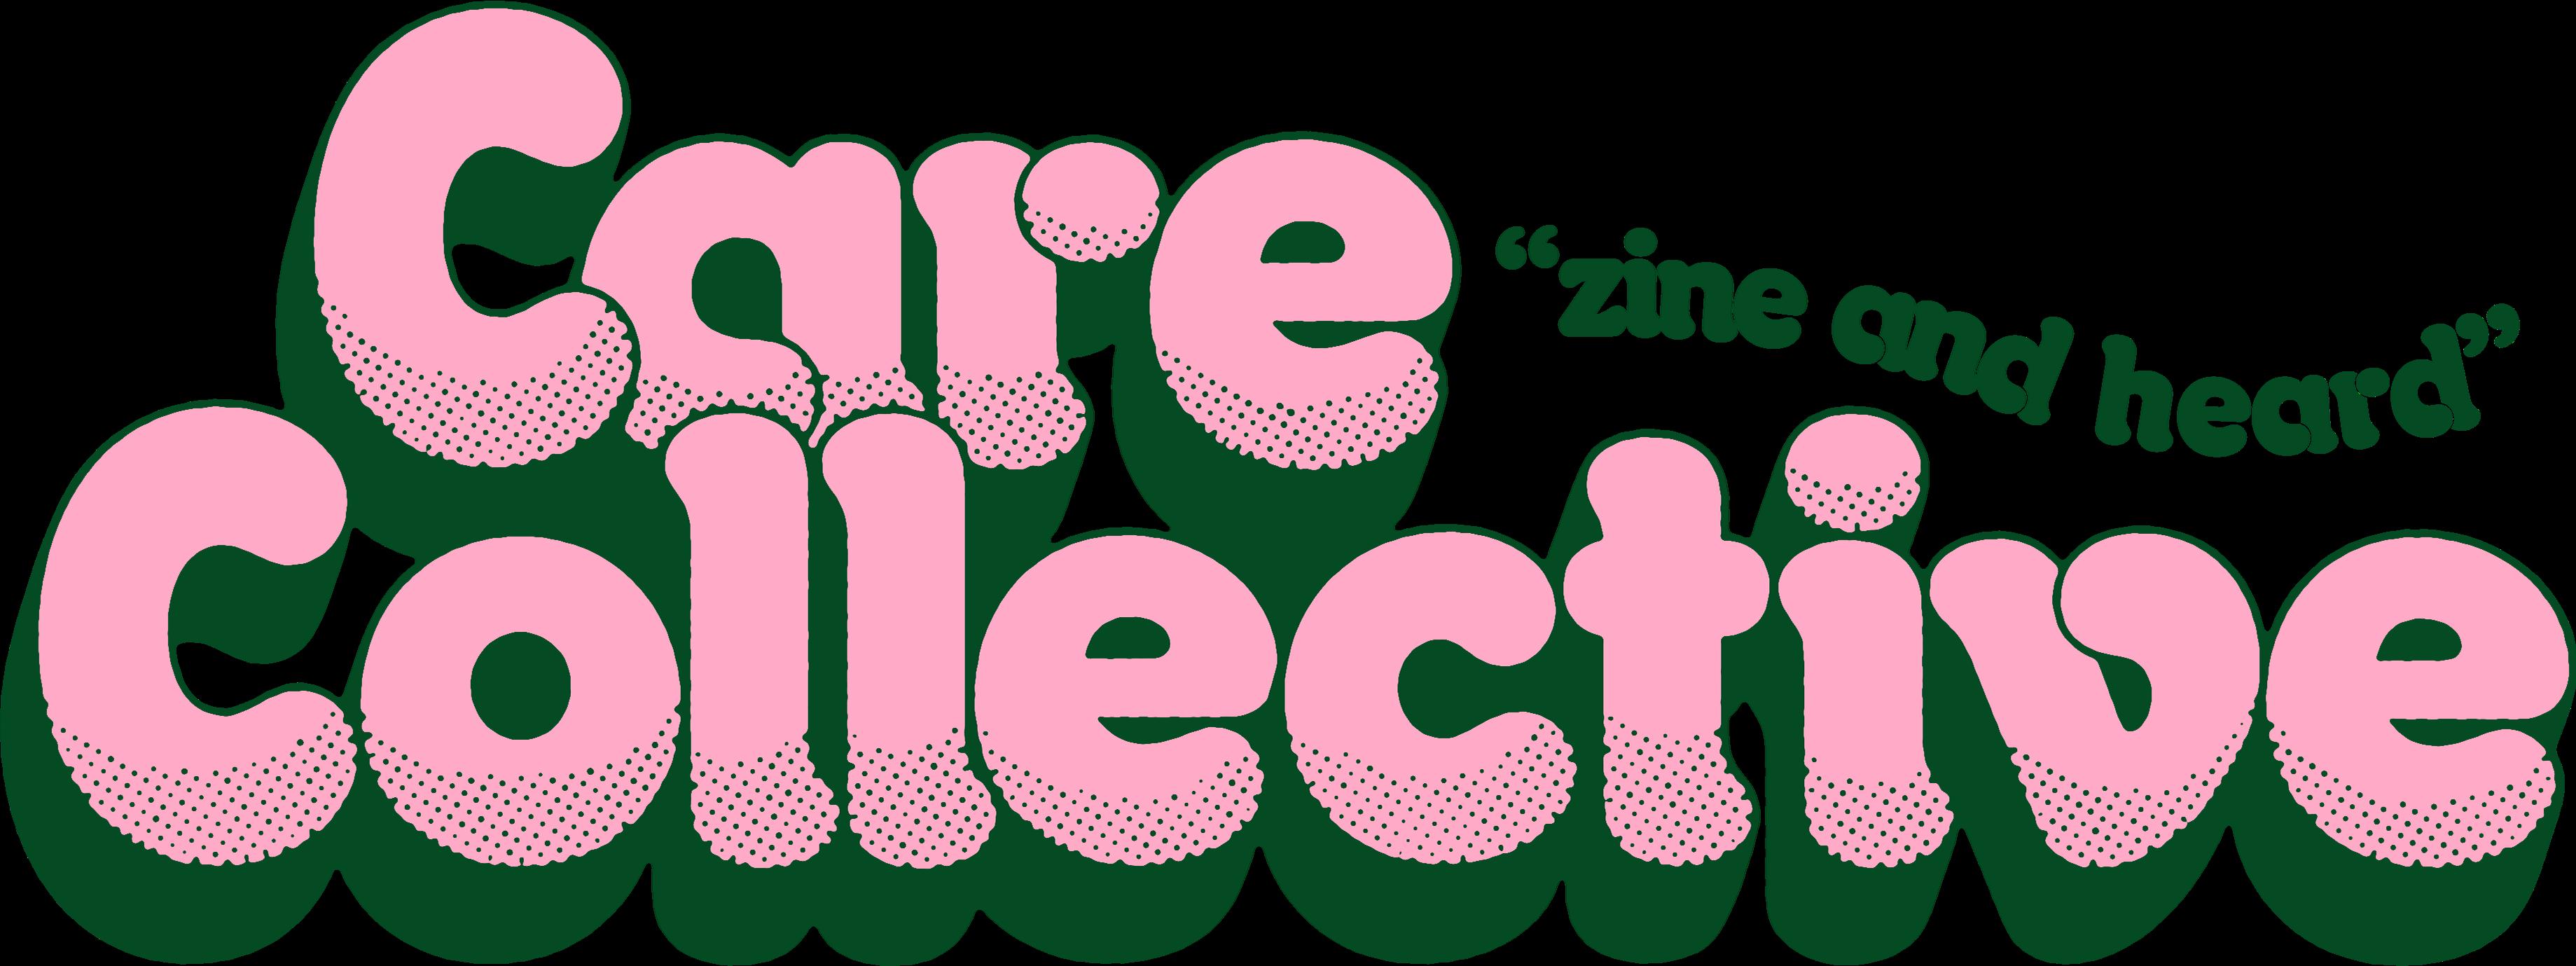 Amour Destiné - Care Collective Zine logo